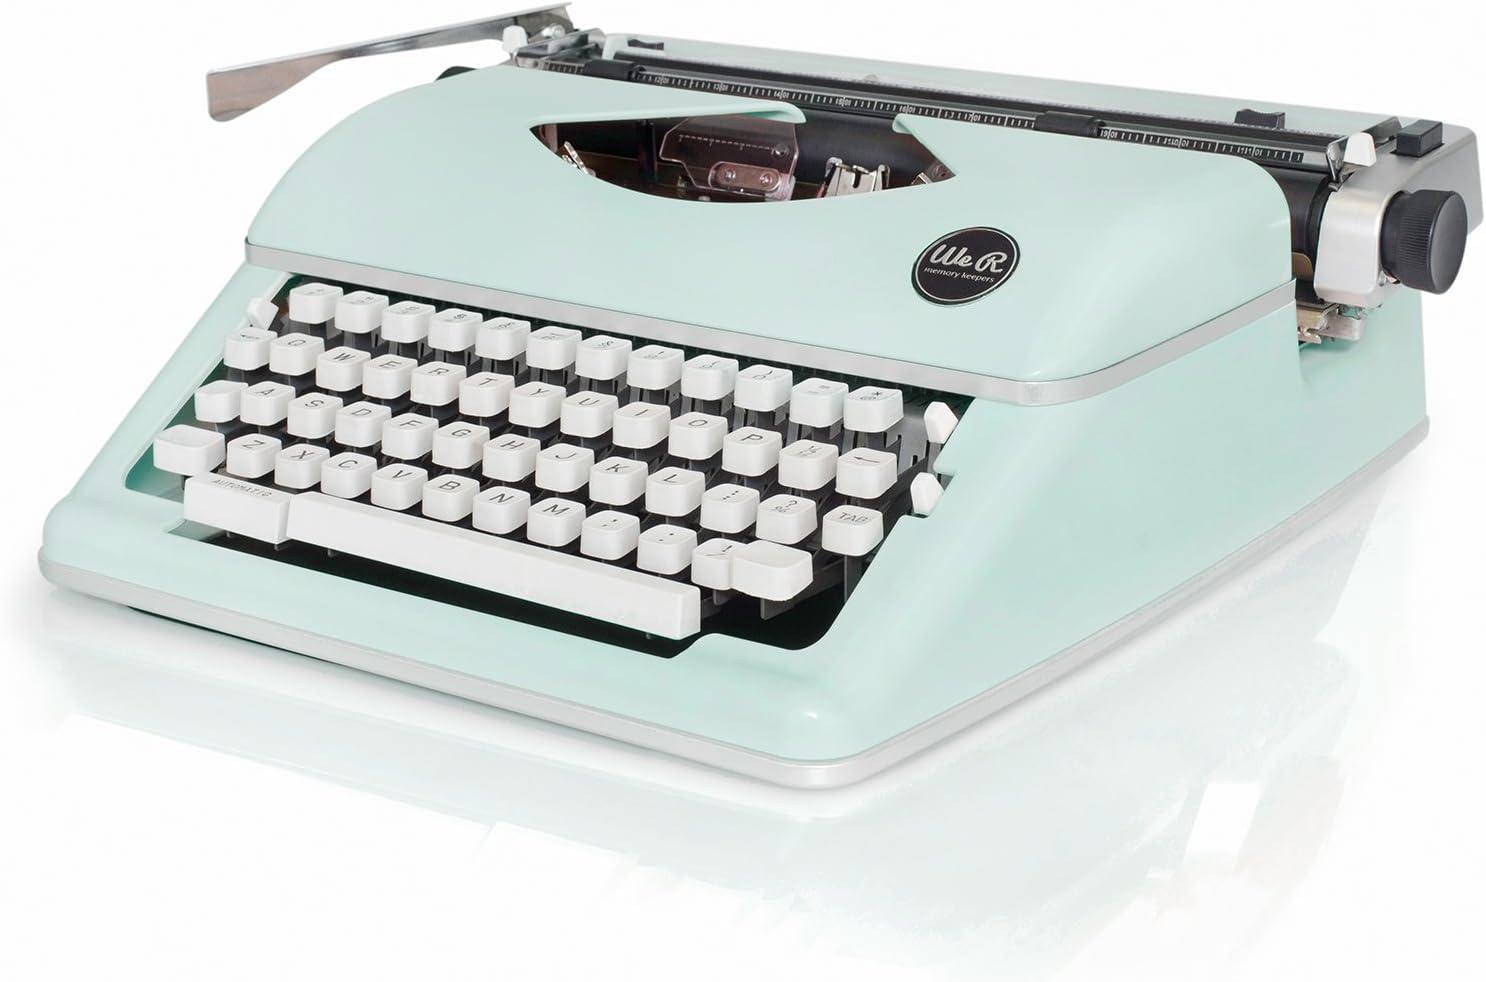 /Nastro bianco//nero American Crafts We R Memory Keepers Typewriter/